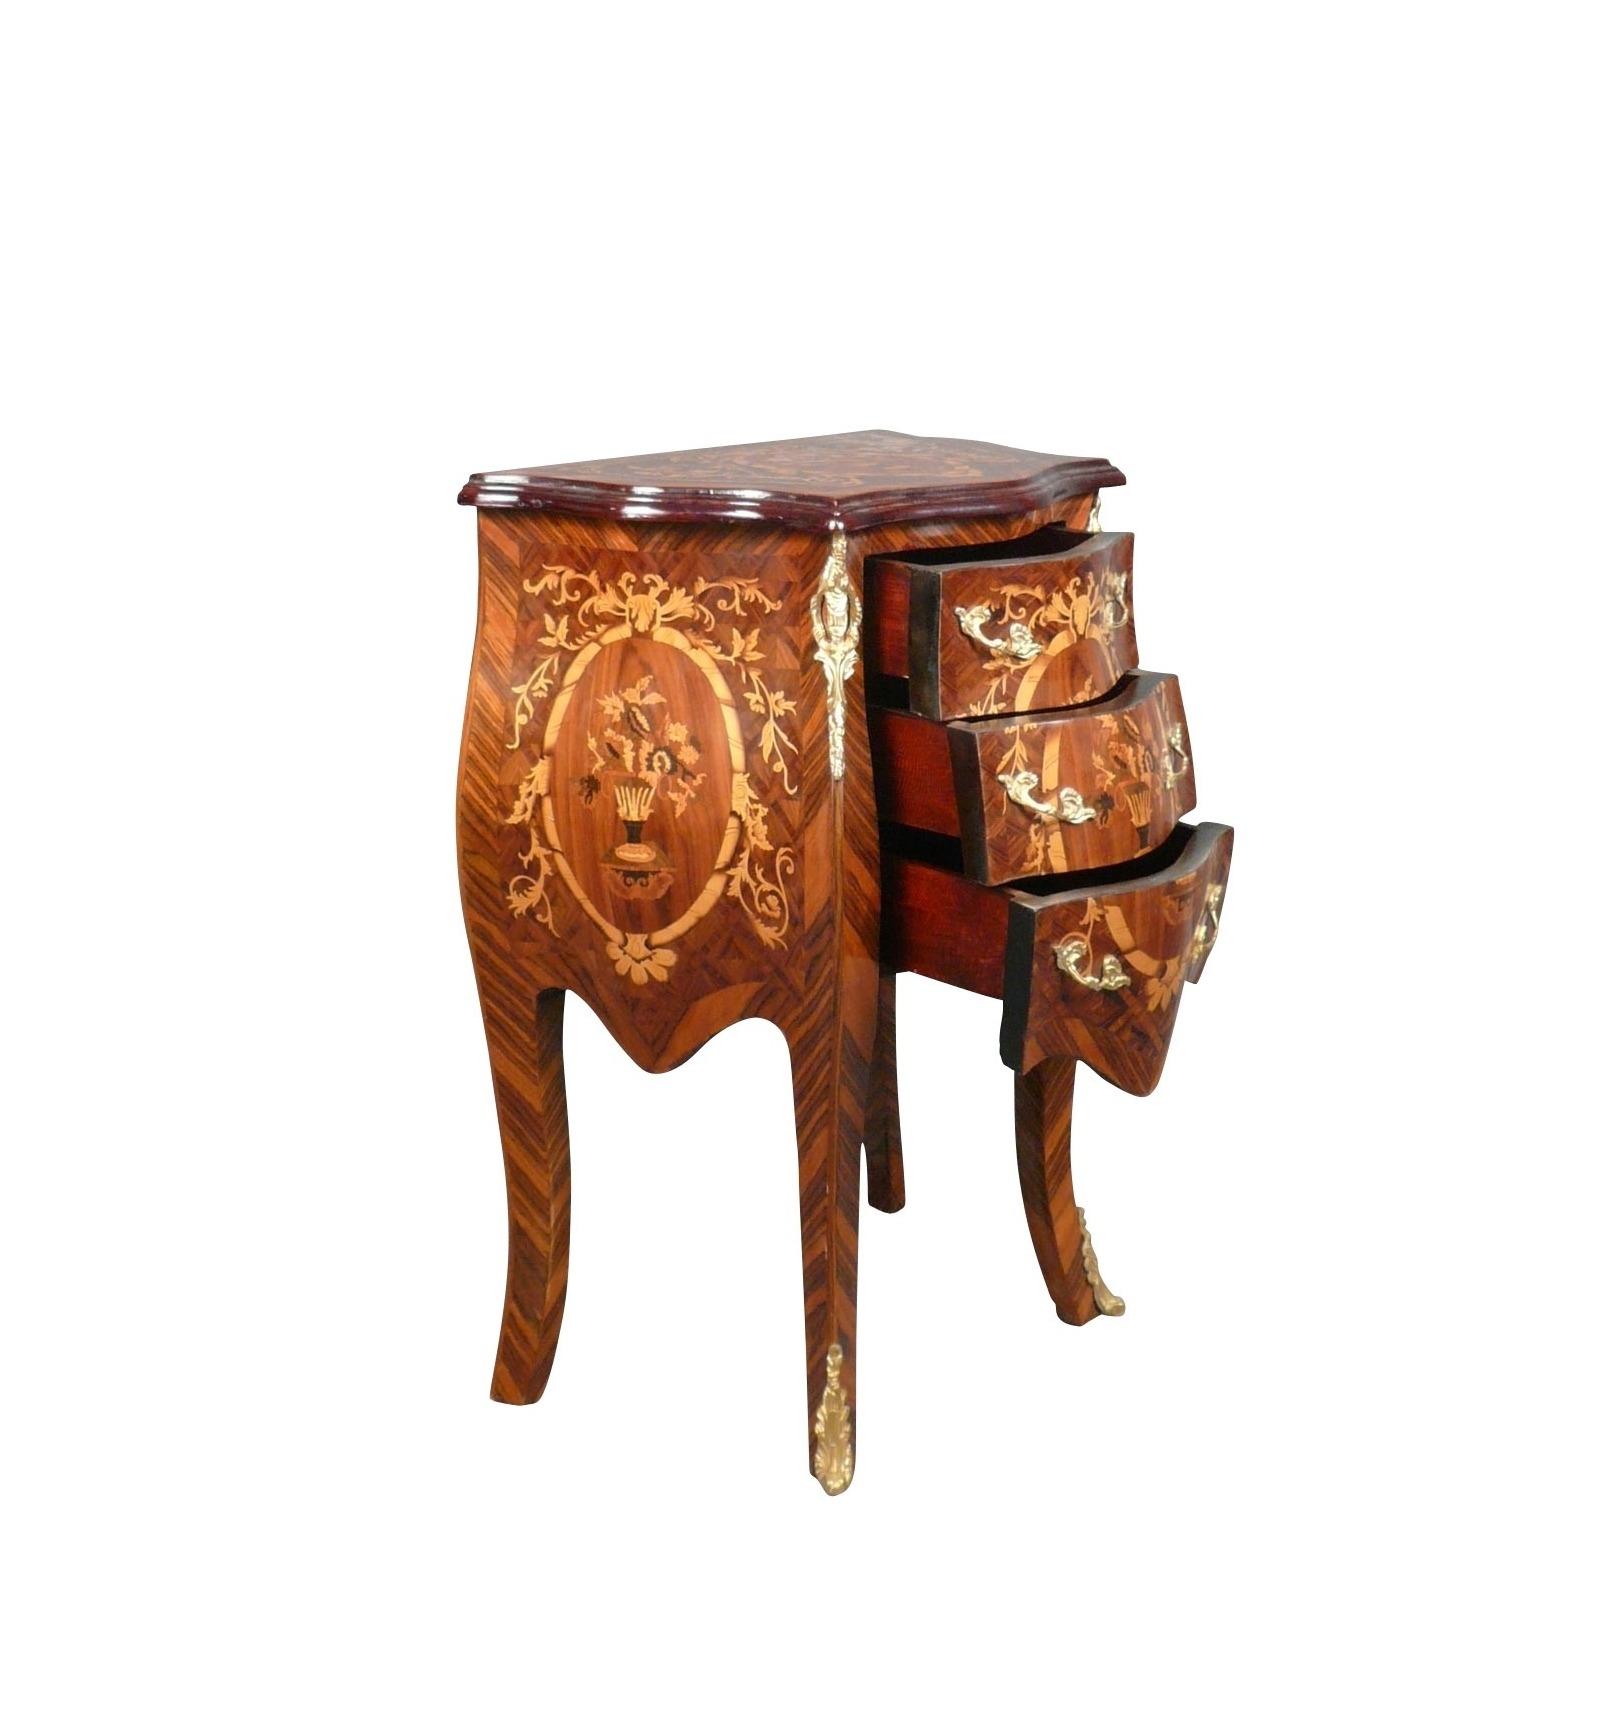 louis xv commode bedside tables and art deco furniture. Black Bedroom Furniture Sets. Home Design Ideas